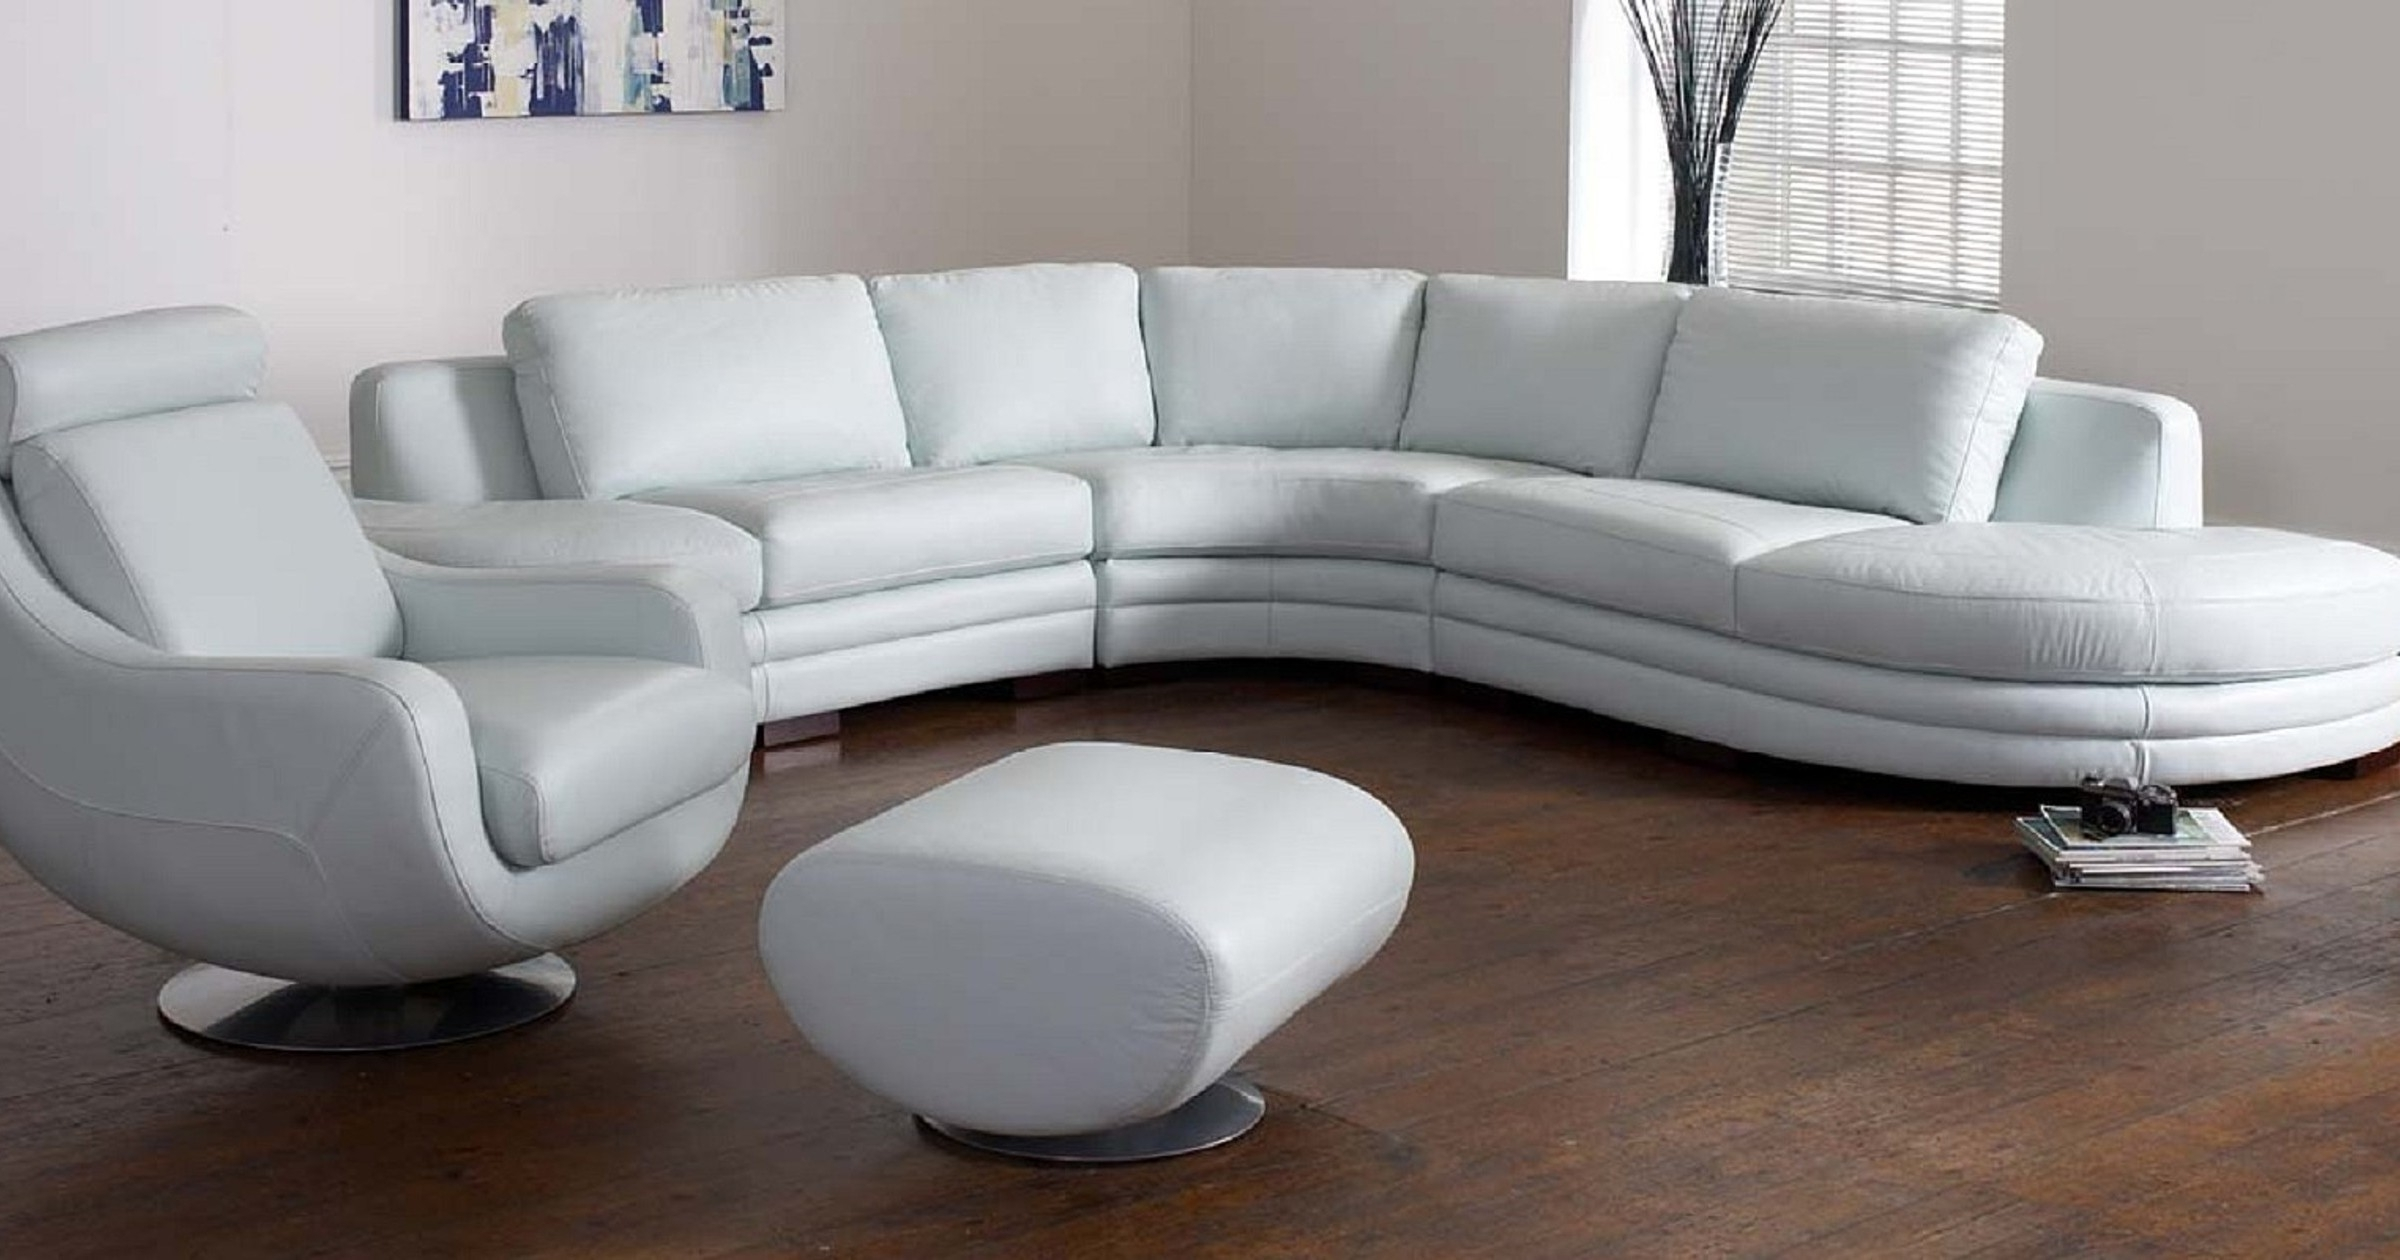 Best And Newest White Leather Corner Sofas With Elegant Designer Leather Corner Sofas – Africaleak (View 1 of 20)